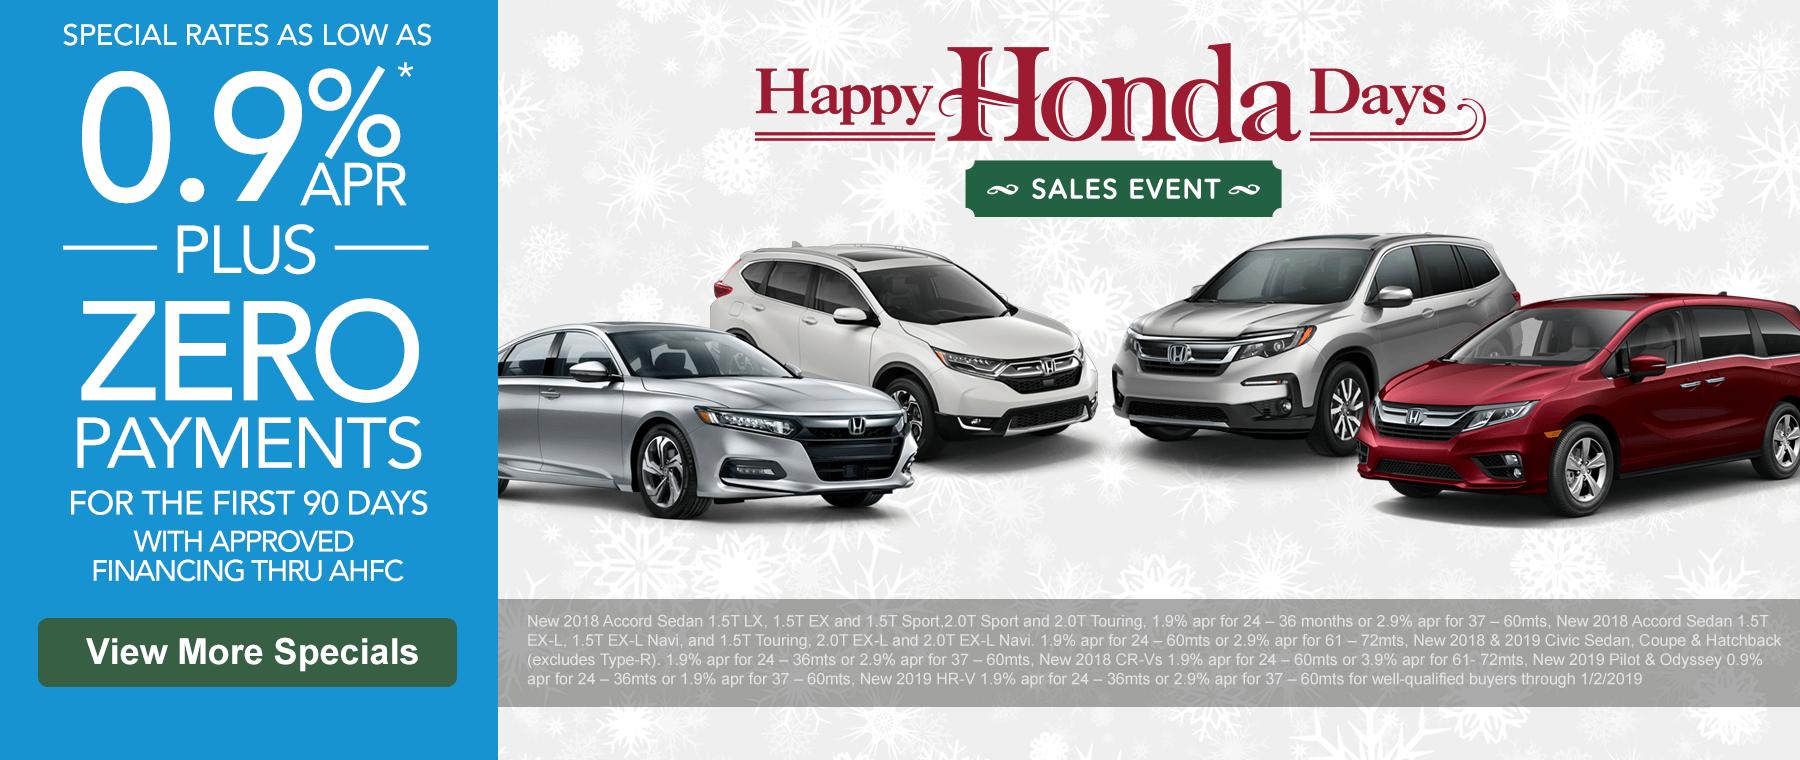 Happy Honda Days Specials